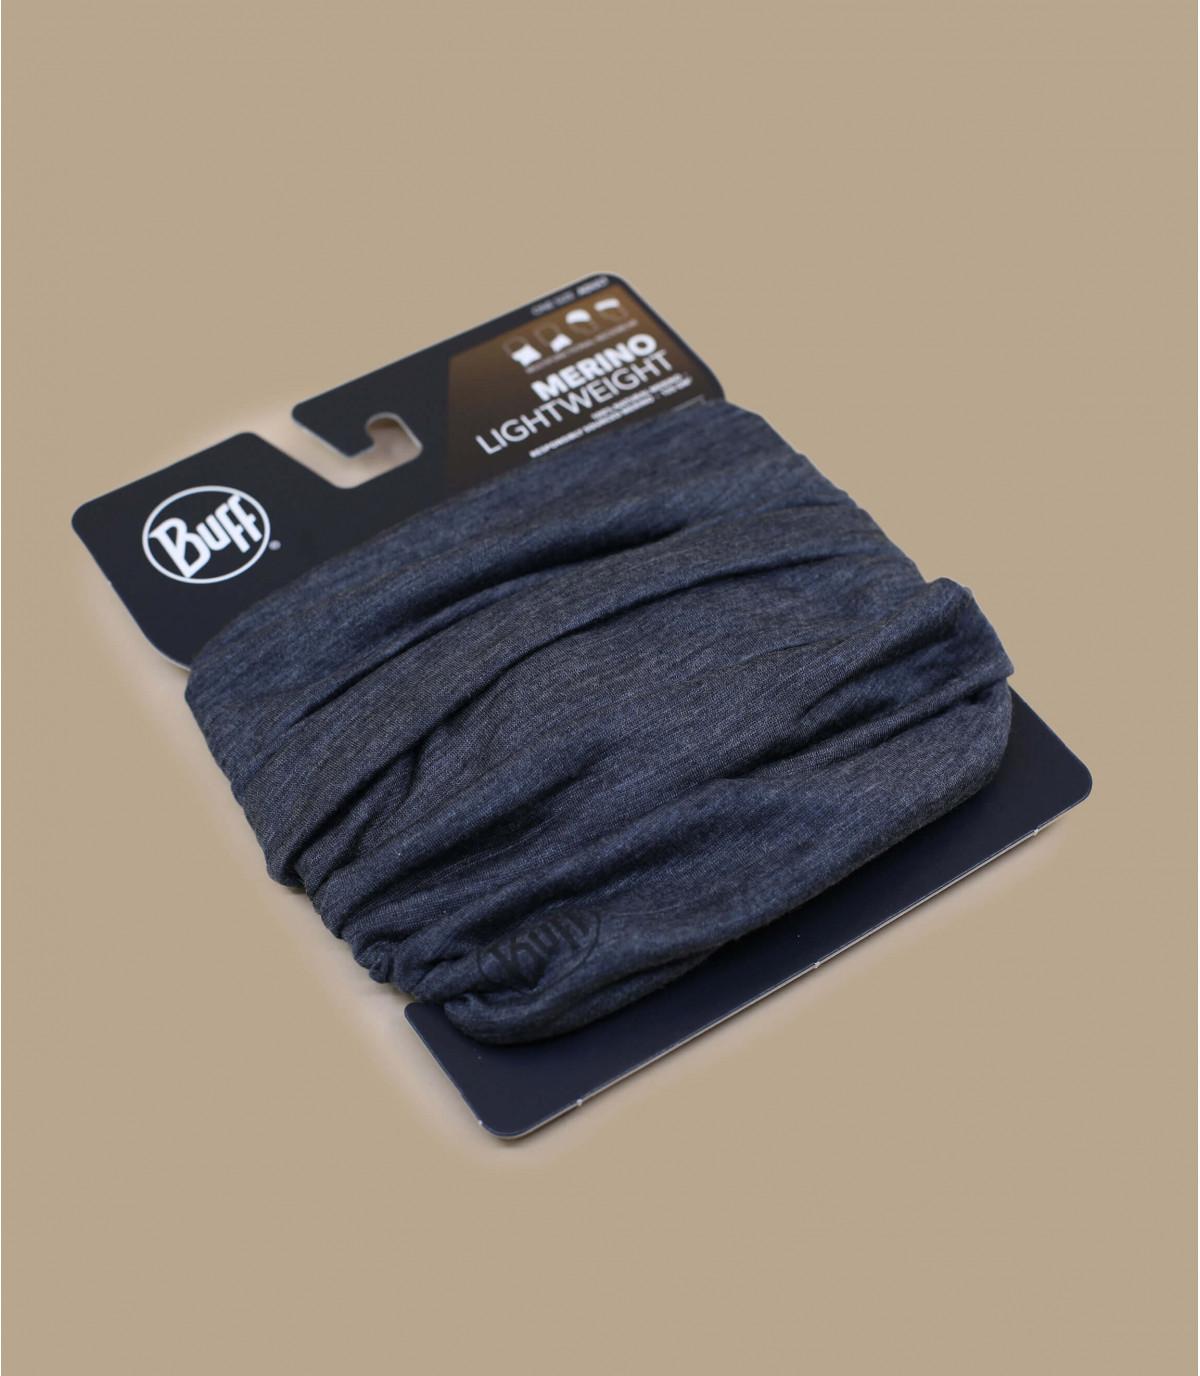 Détails Lightweight Merino Wool solid grey - image 2